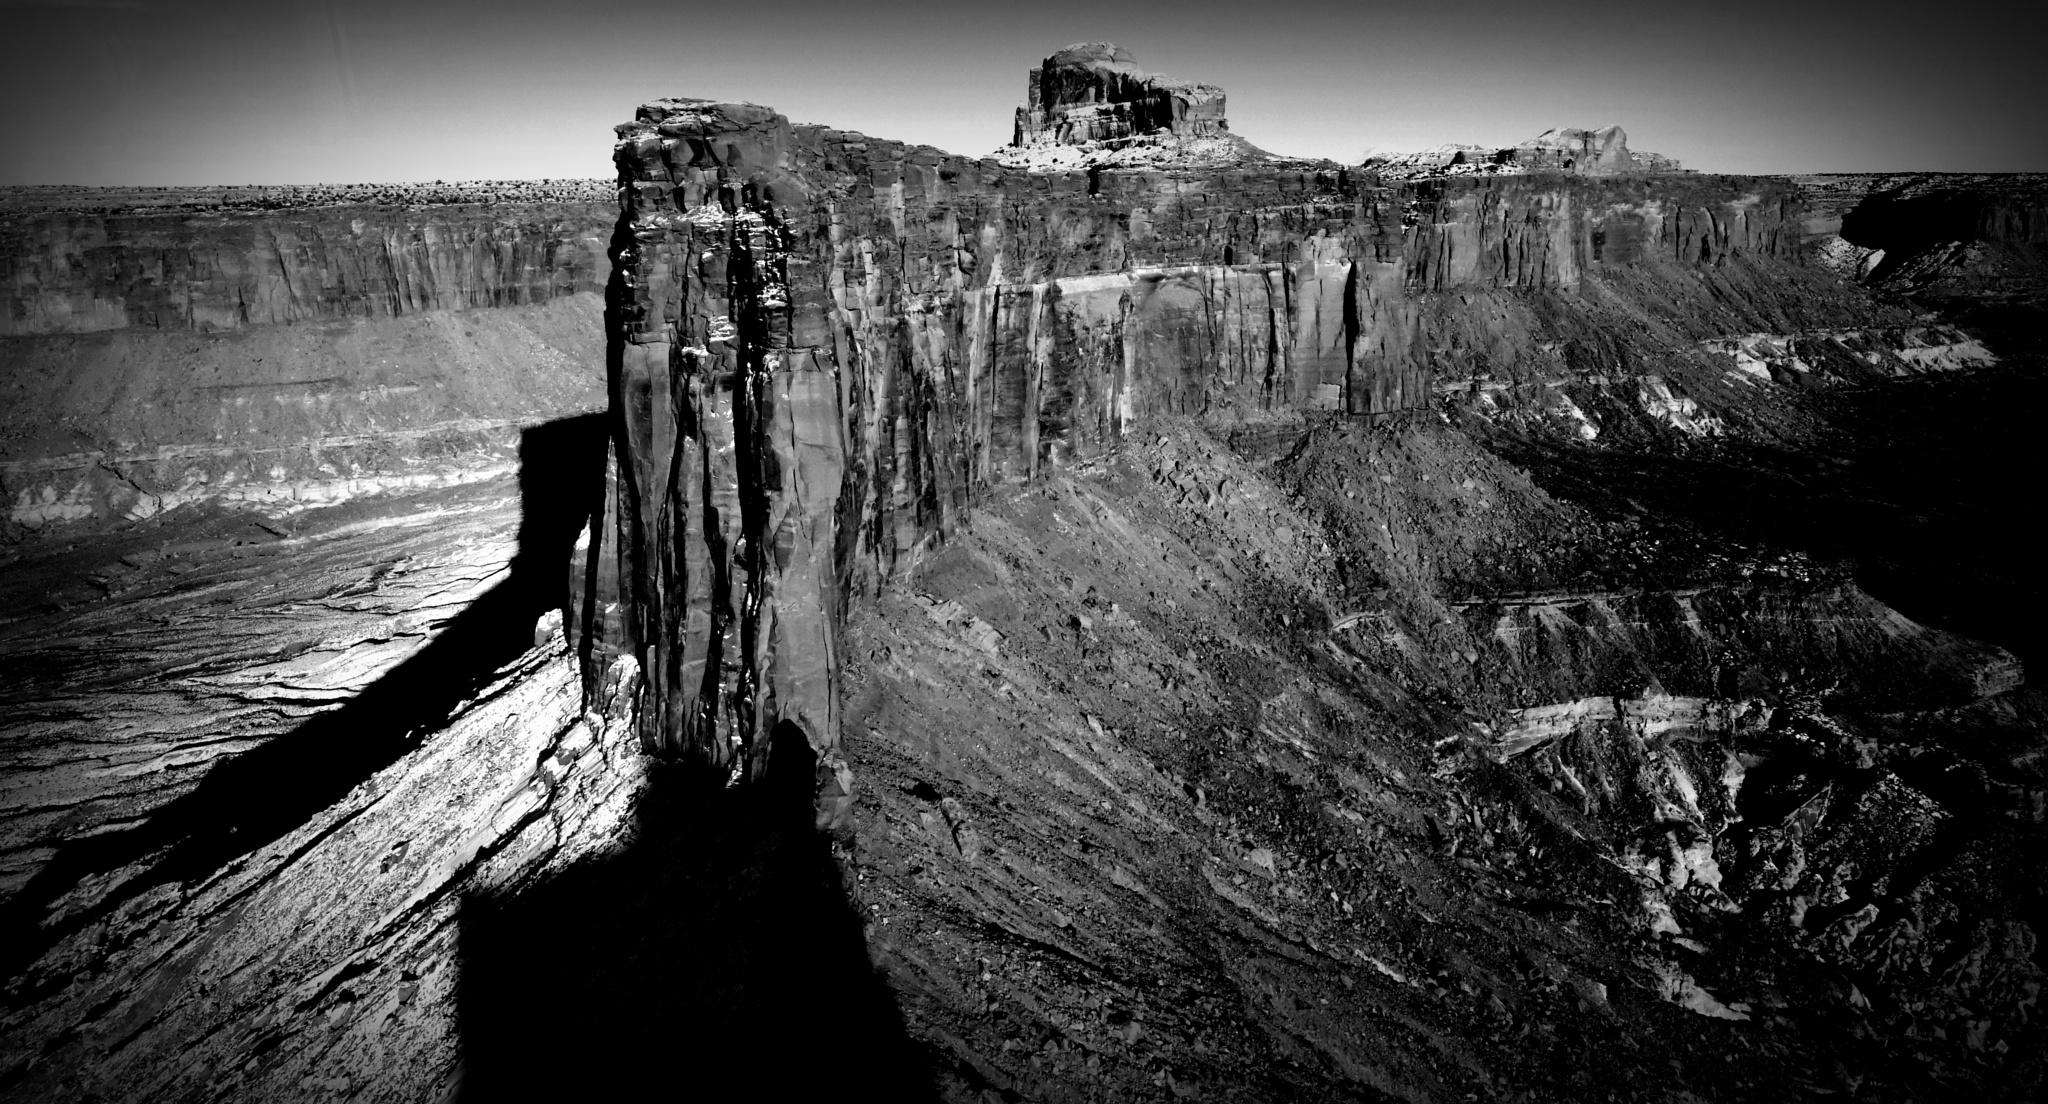 Canyon Dreams by Mark Rupert